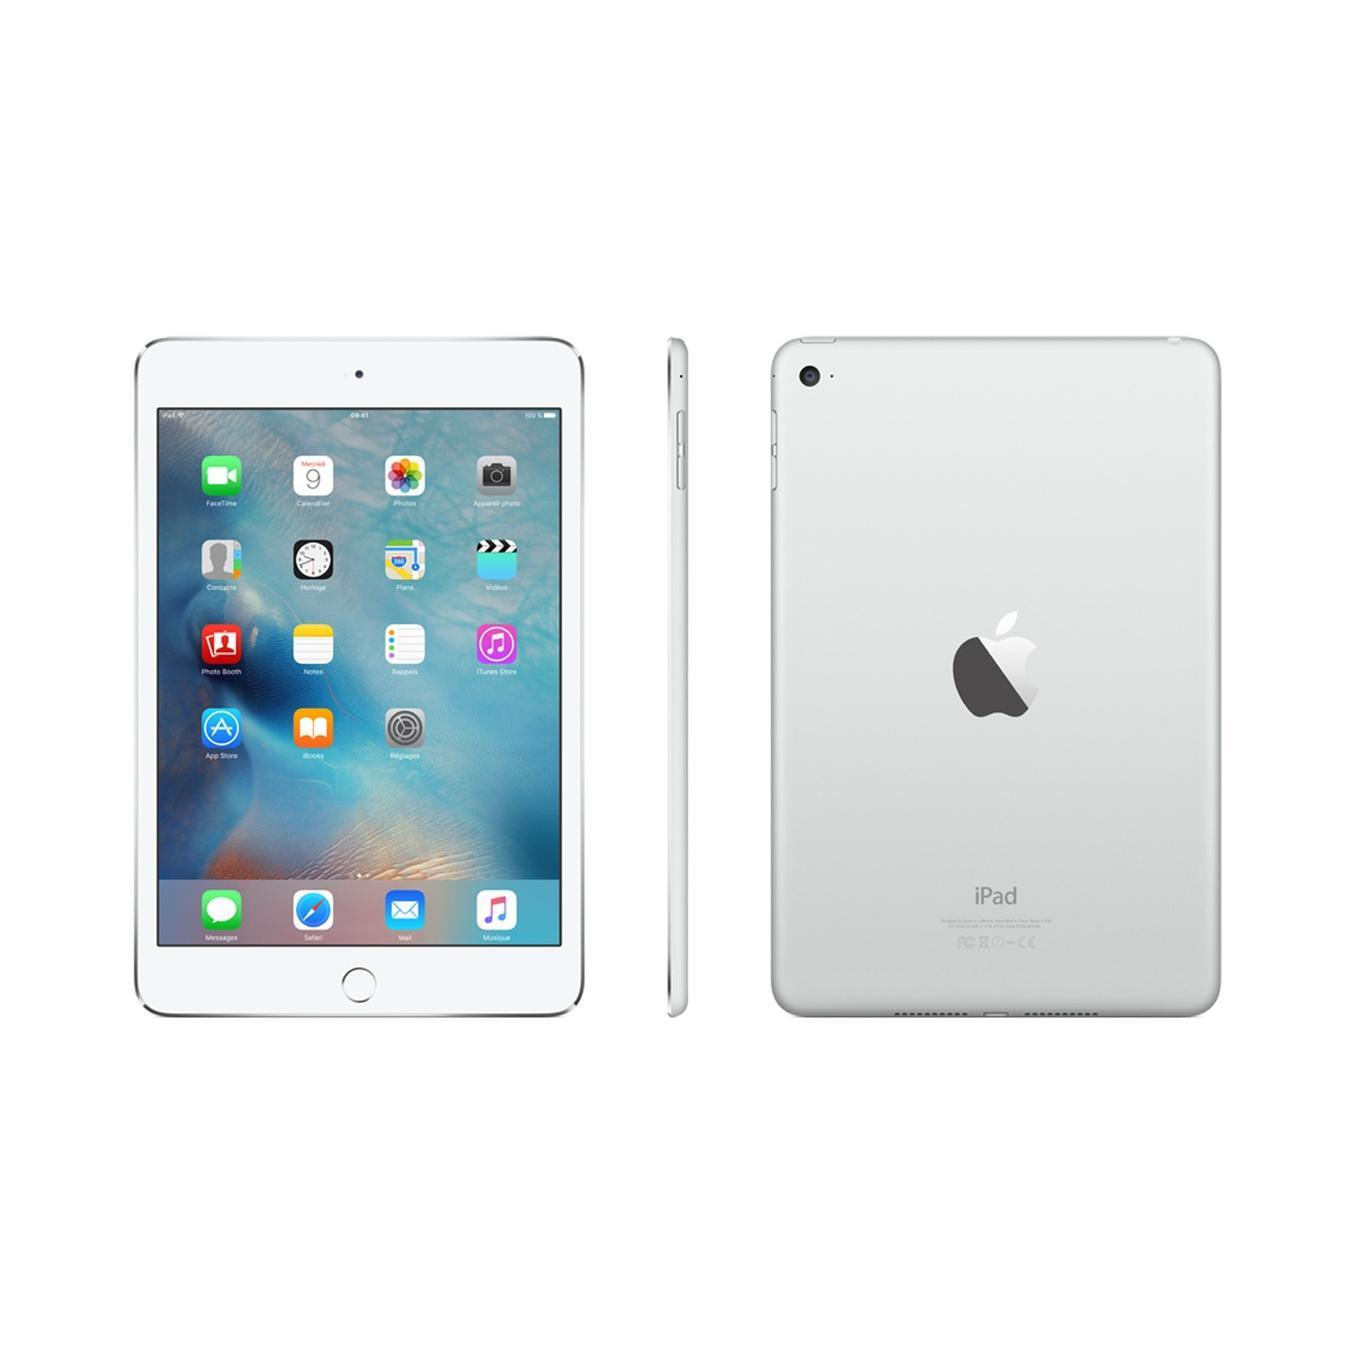 iPad mini 4 128 Go - Wifi - Argent